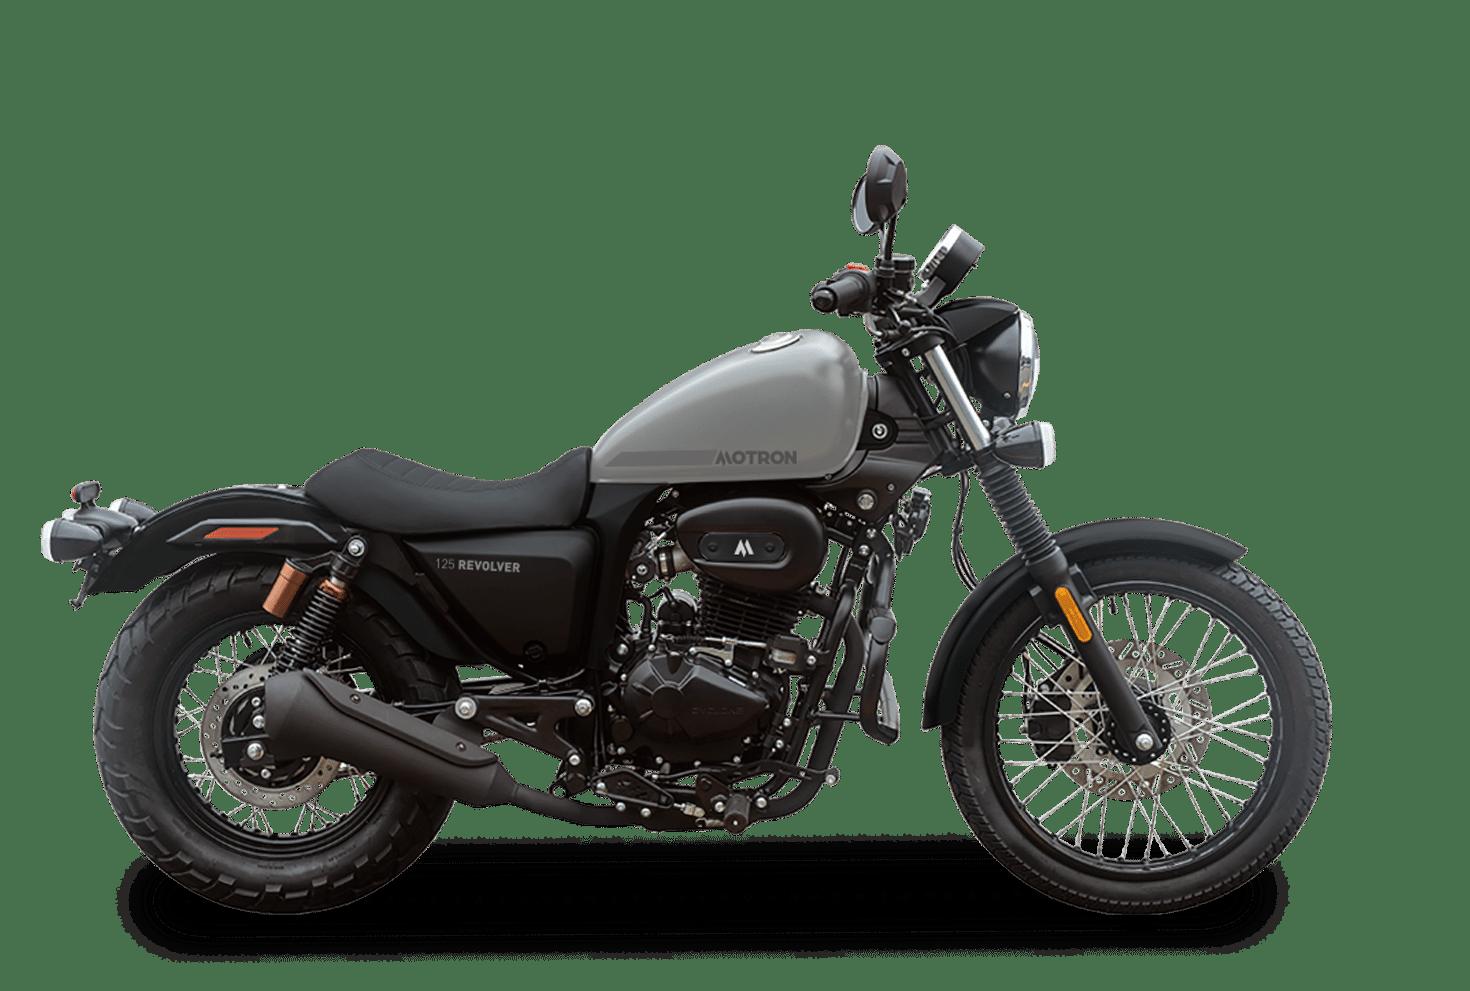 Motron Motorcycles - Revolver 125